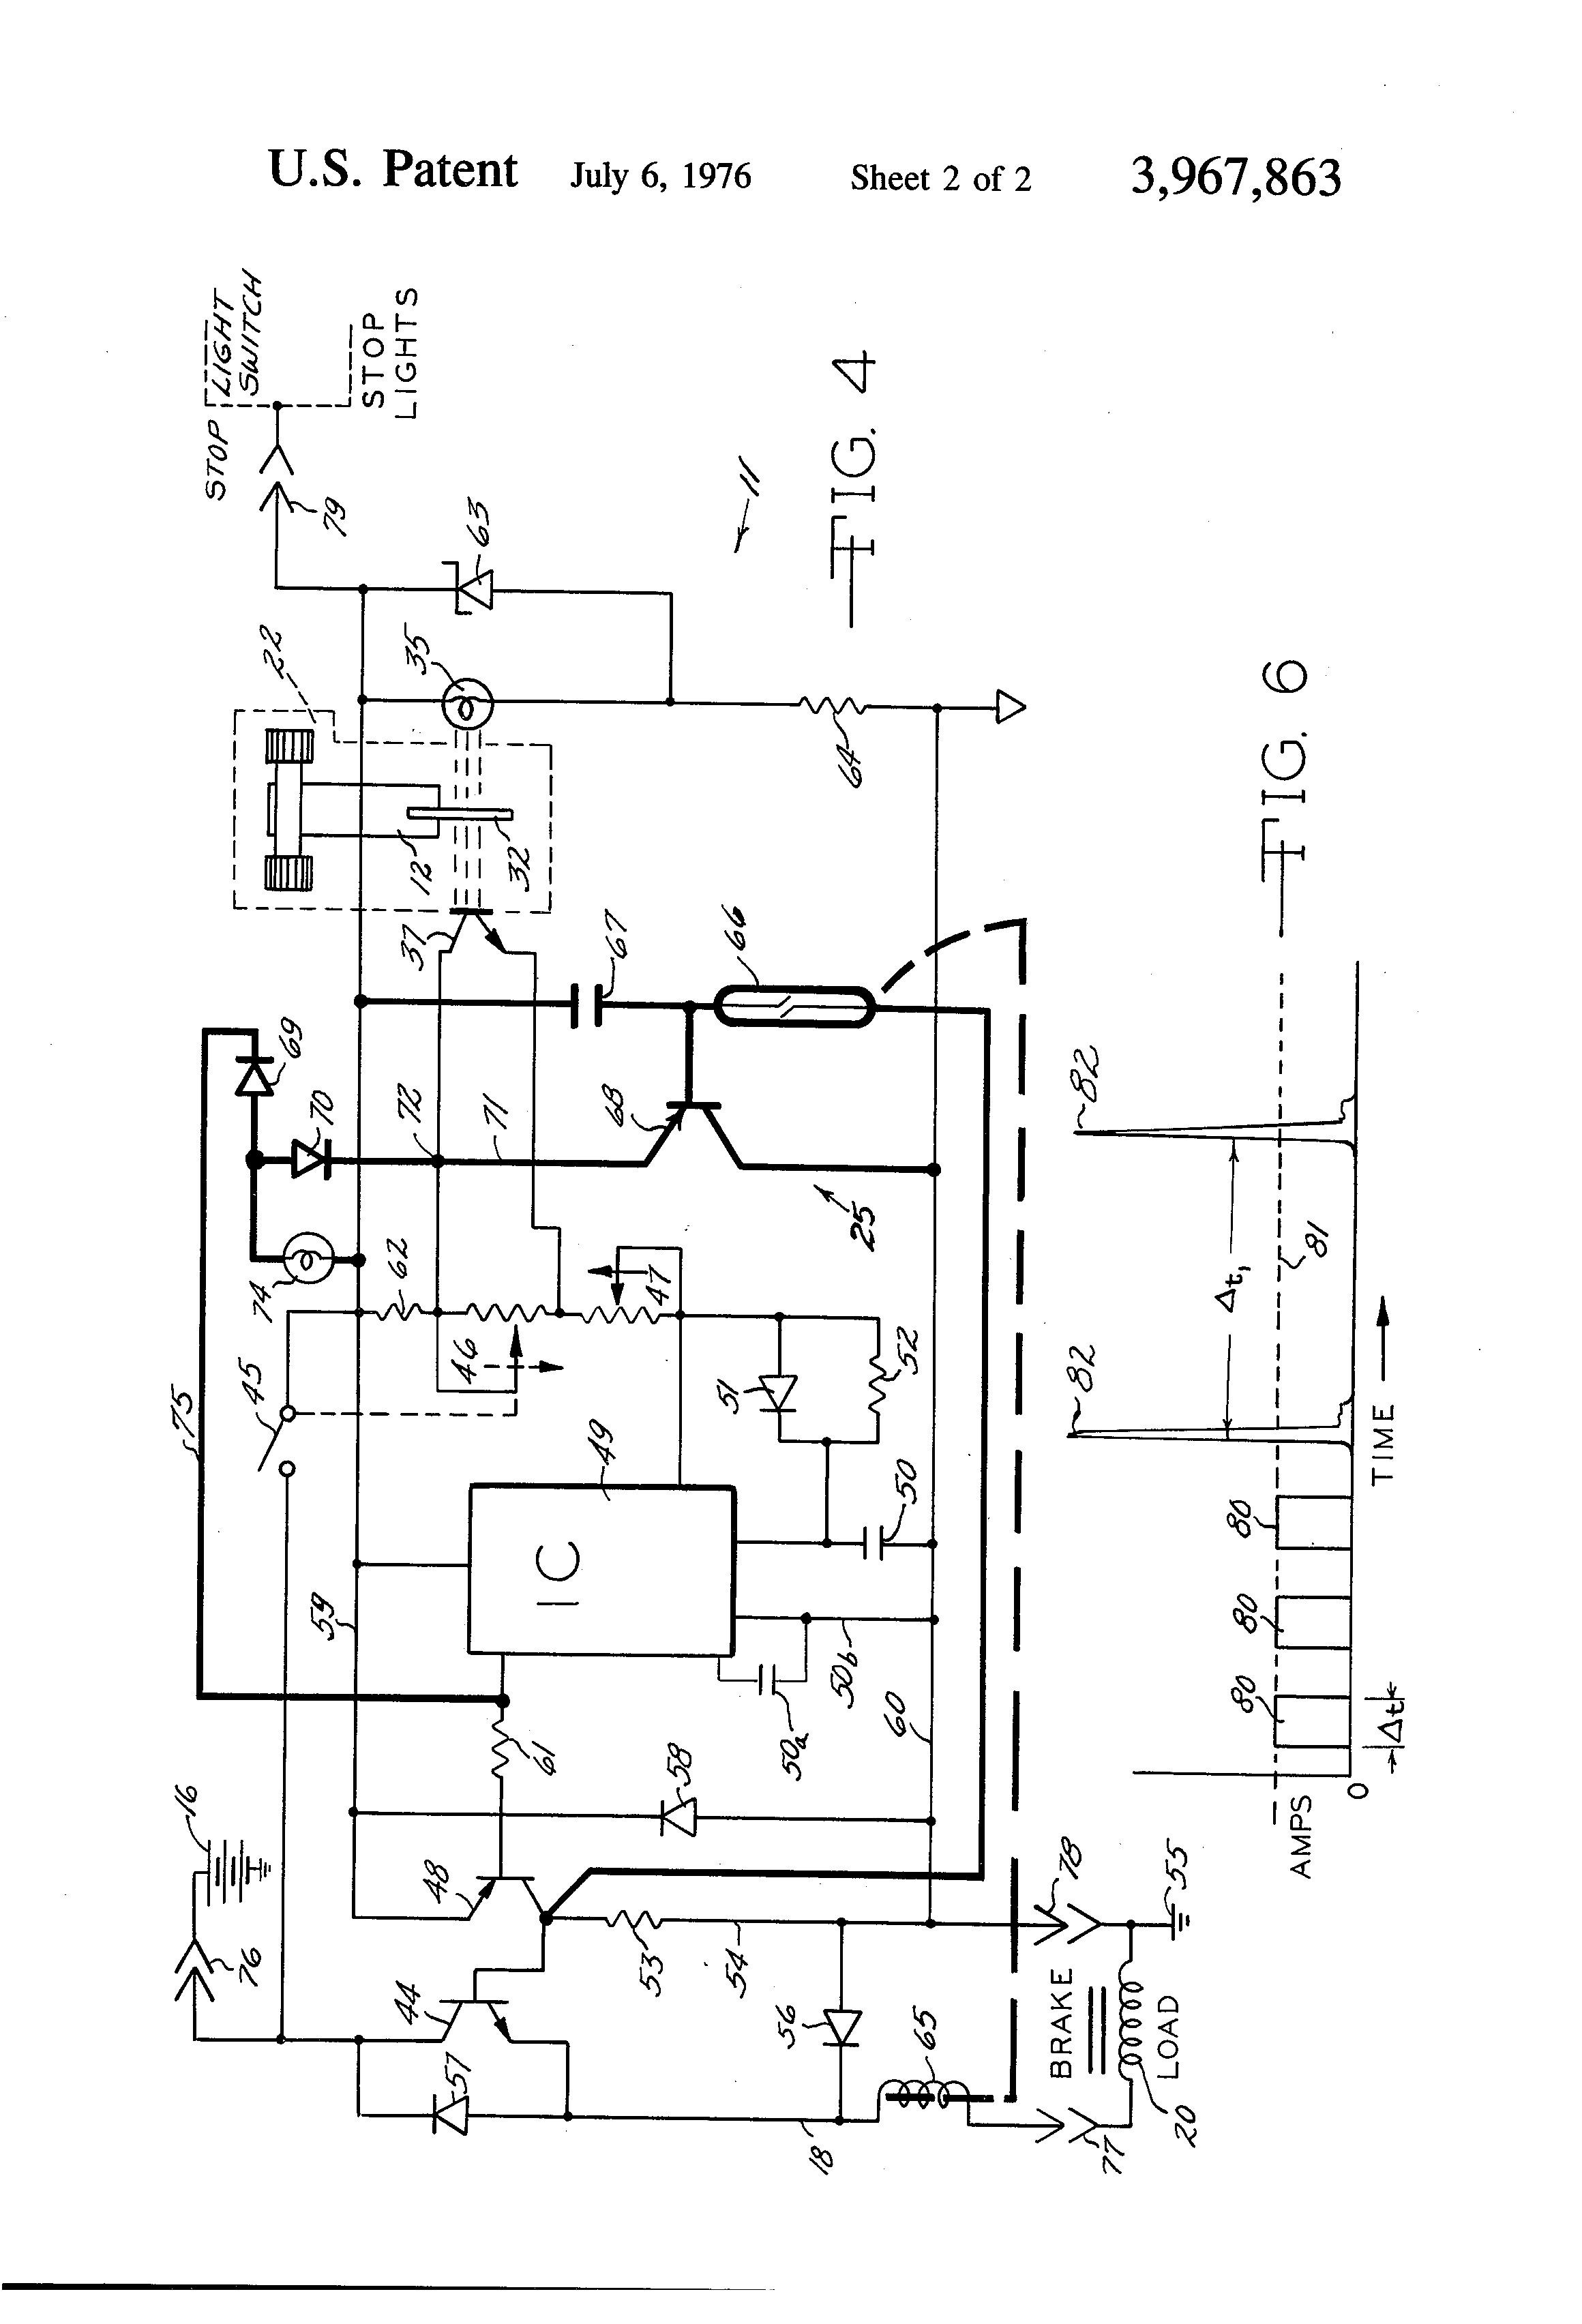 Kw T800 Brake Wiring Diagram. 2002 t800 kenworth i need the starter circuit  wiring diagram. 97 kenworth t800 jake switch wiring diagram. kenworth wiring  diagram pdf free wiring diagram. kenworth w900 headlight2002-acura-tl-radio.info